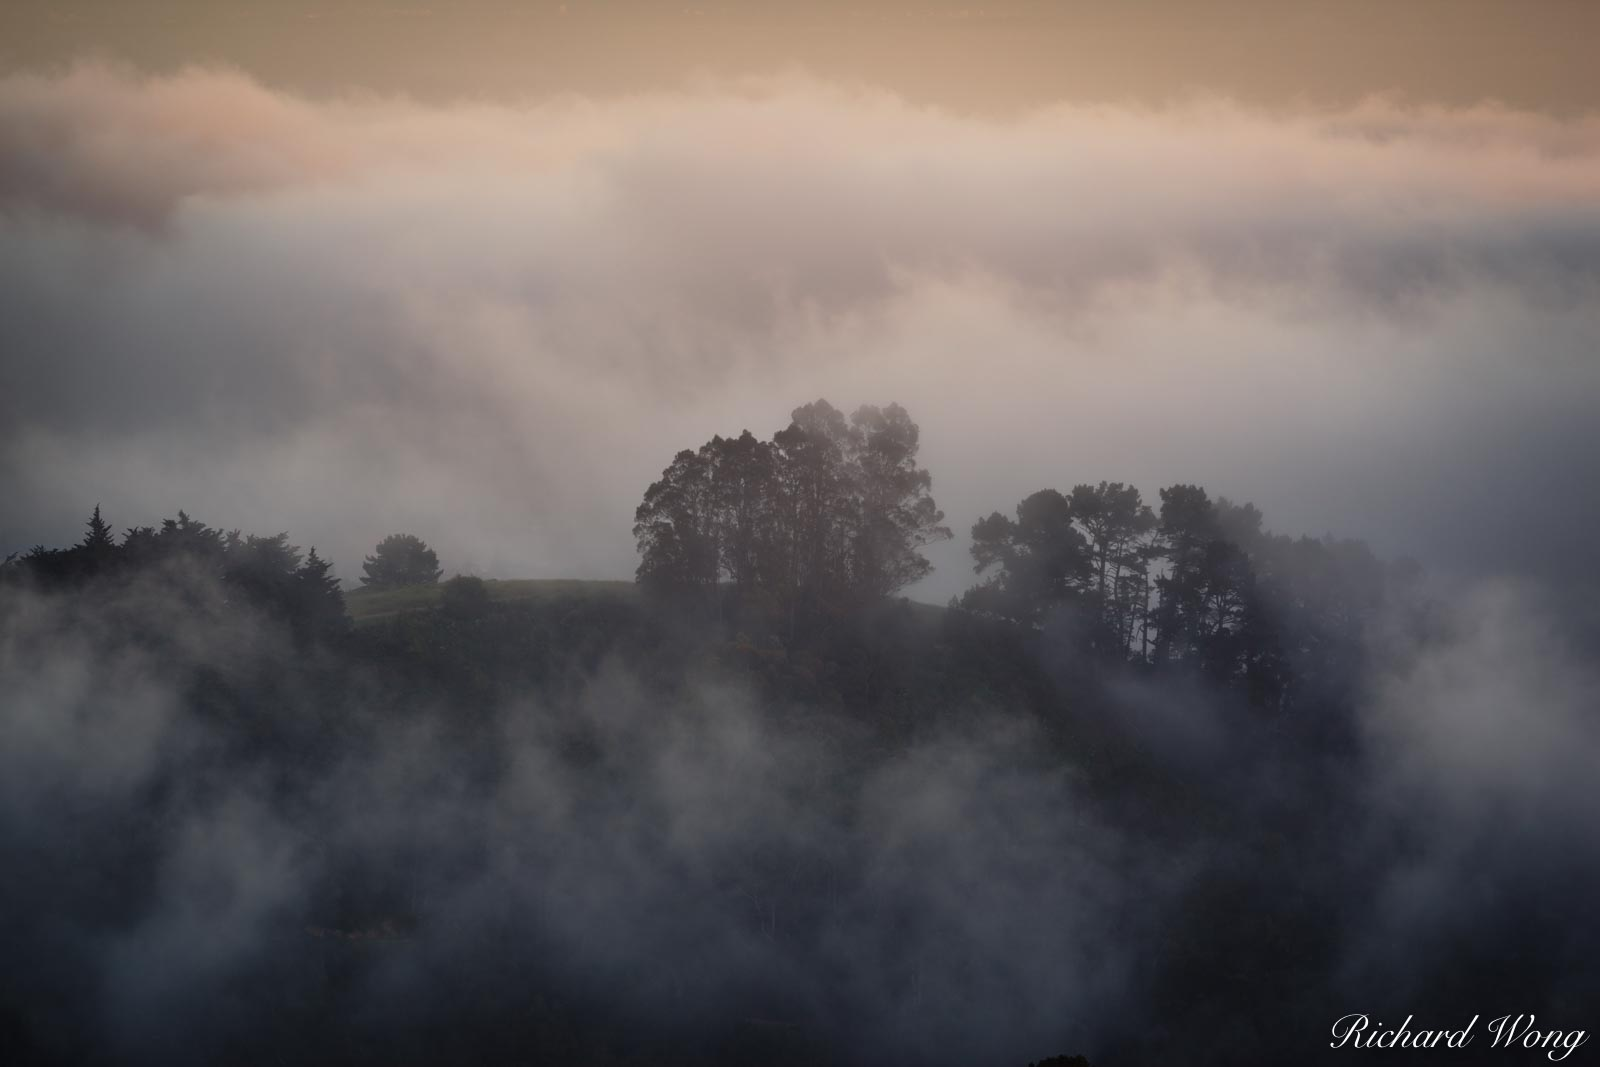 Fog in Grizzly Peak, Berkeley Hills, California, photo, photo